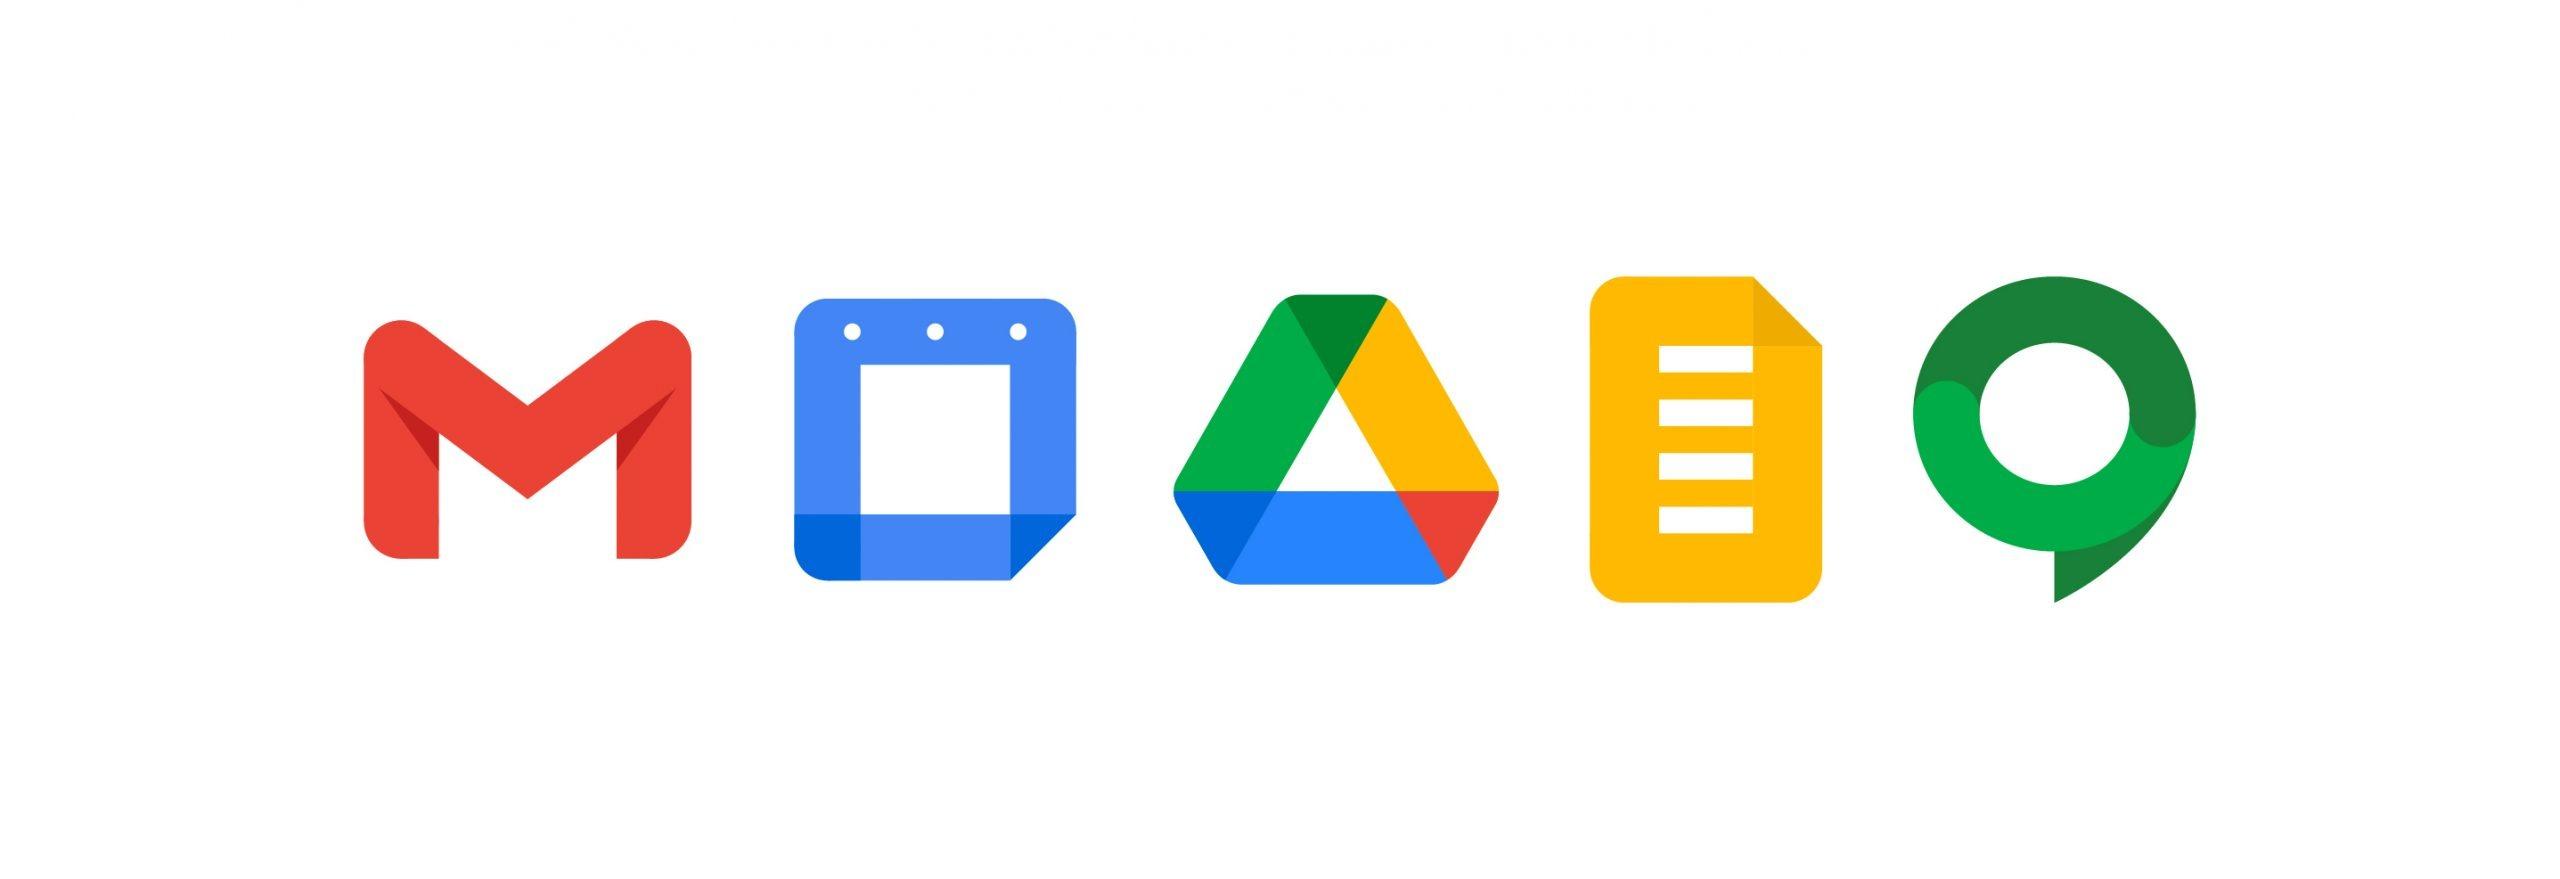 DotYeti Google New Logos 2020 Solution